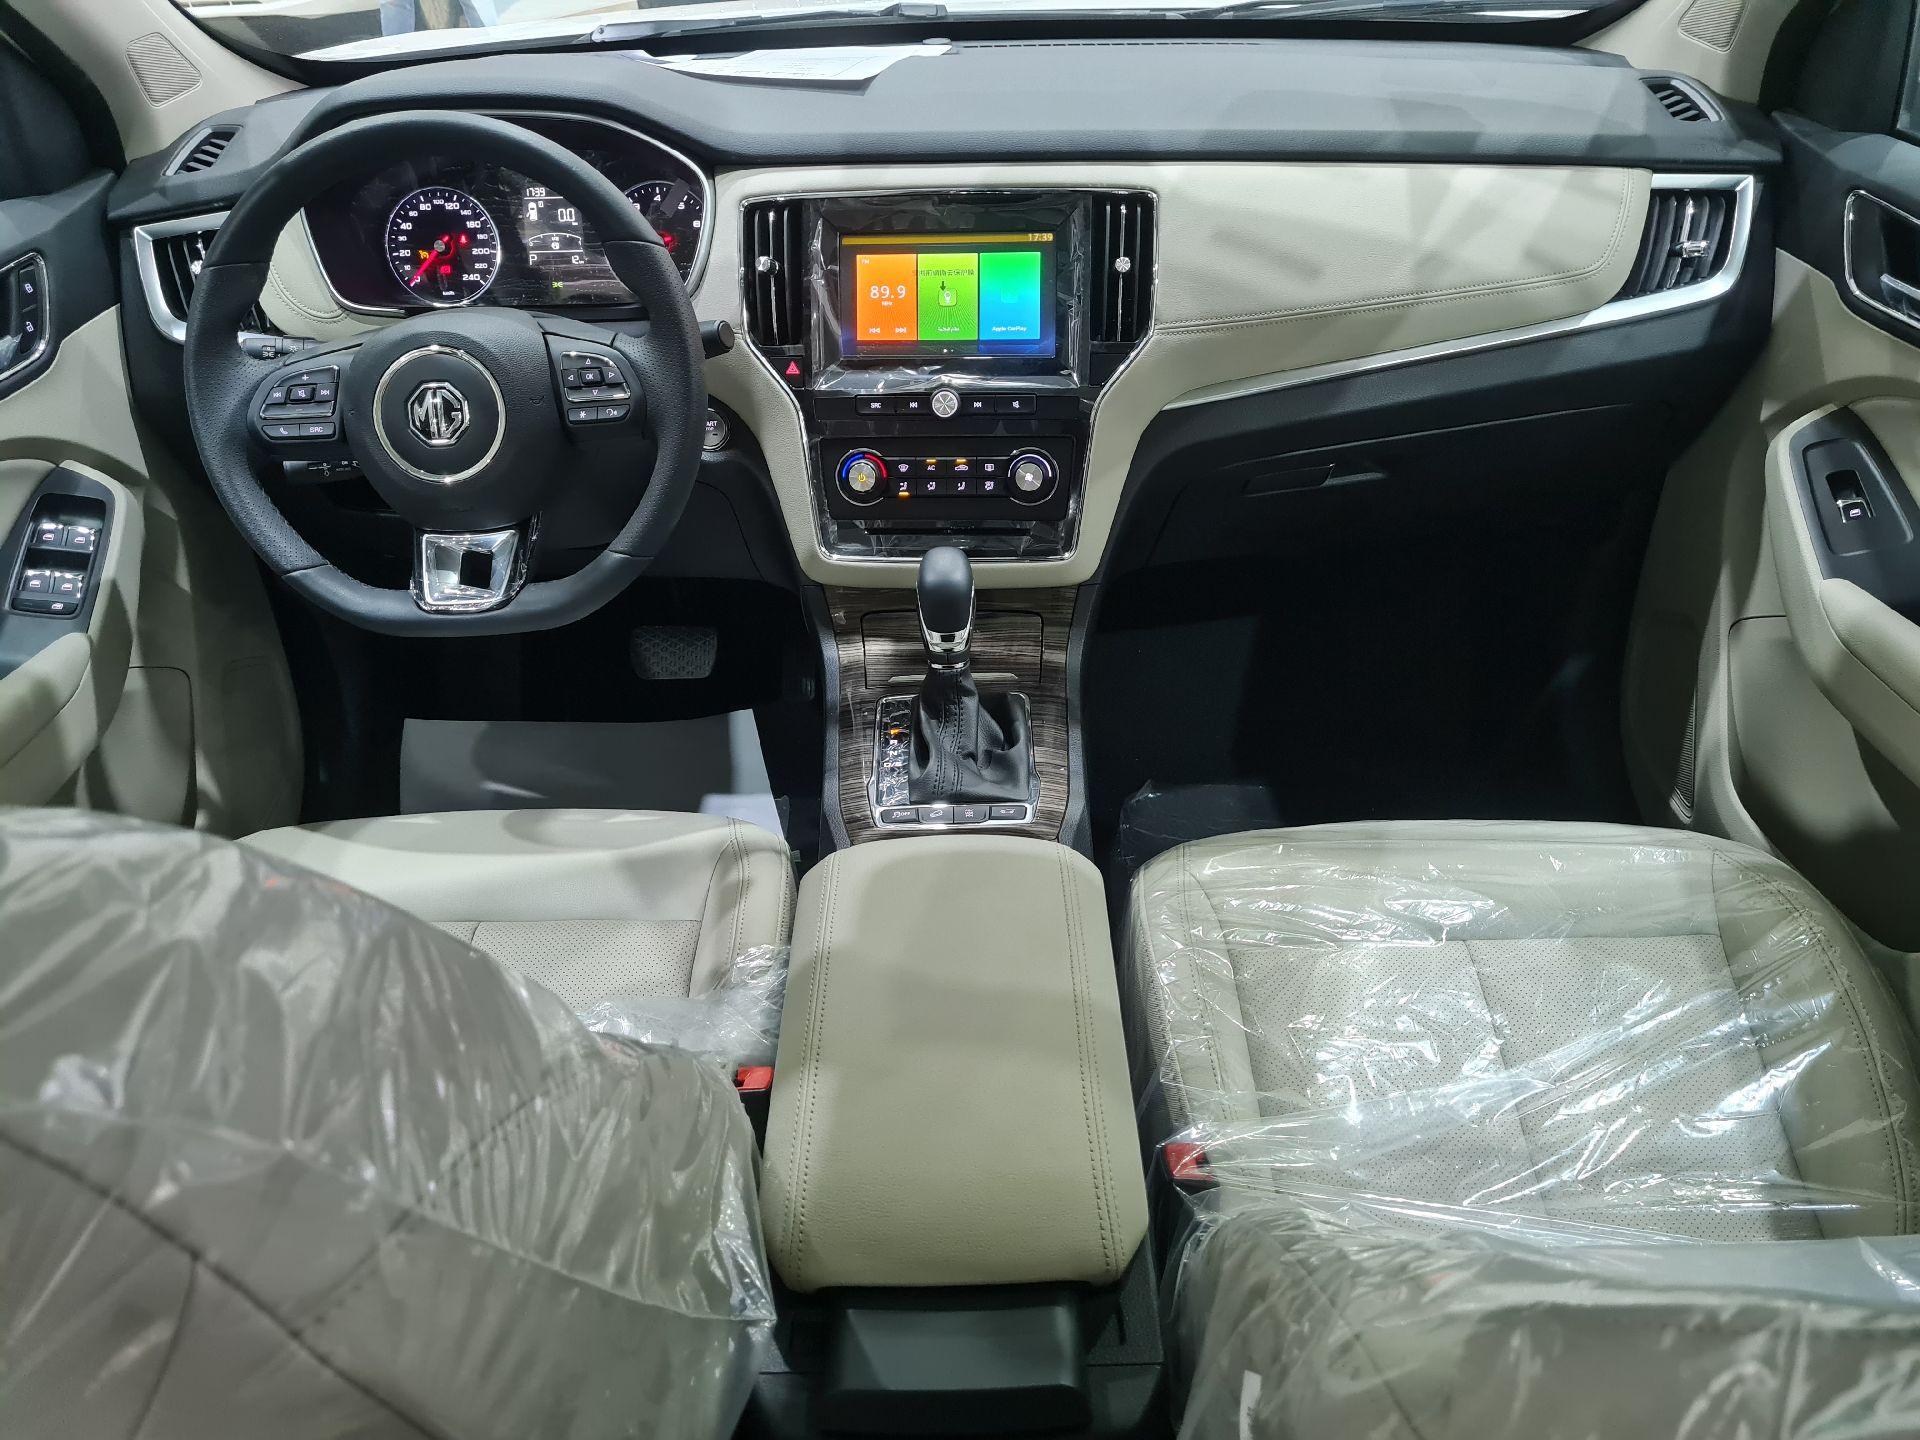 MG RX5 LUX 2020 فل سعودي للبيع في الرياض - السعودية - صورة كبيرة - 14